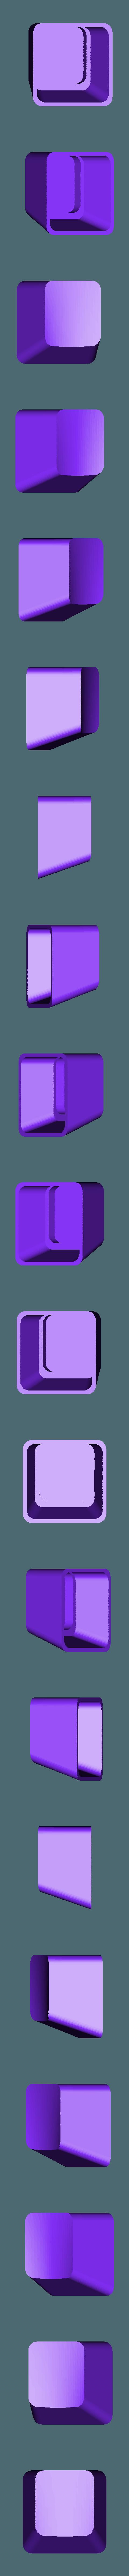 blank_cap.stl Download free STL file Key cap • 3D printing object, MakeItWork